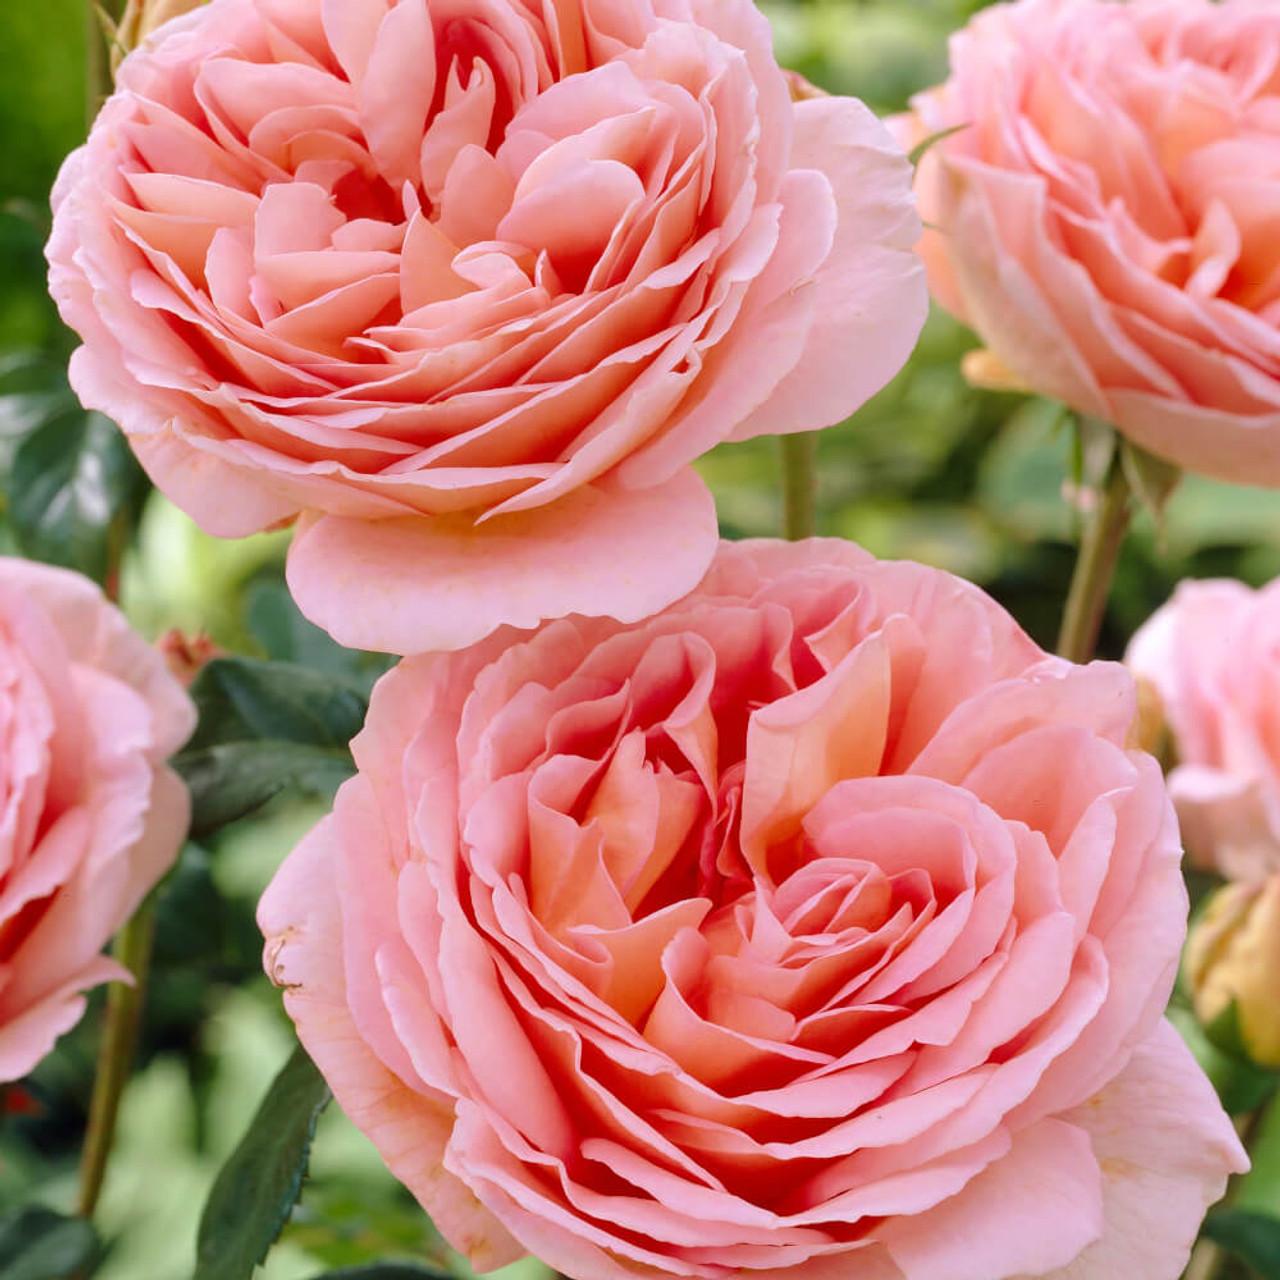 Результат пошуку зображень за запитом abraham darby rose